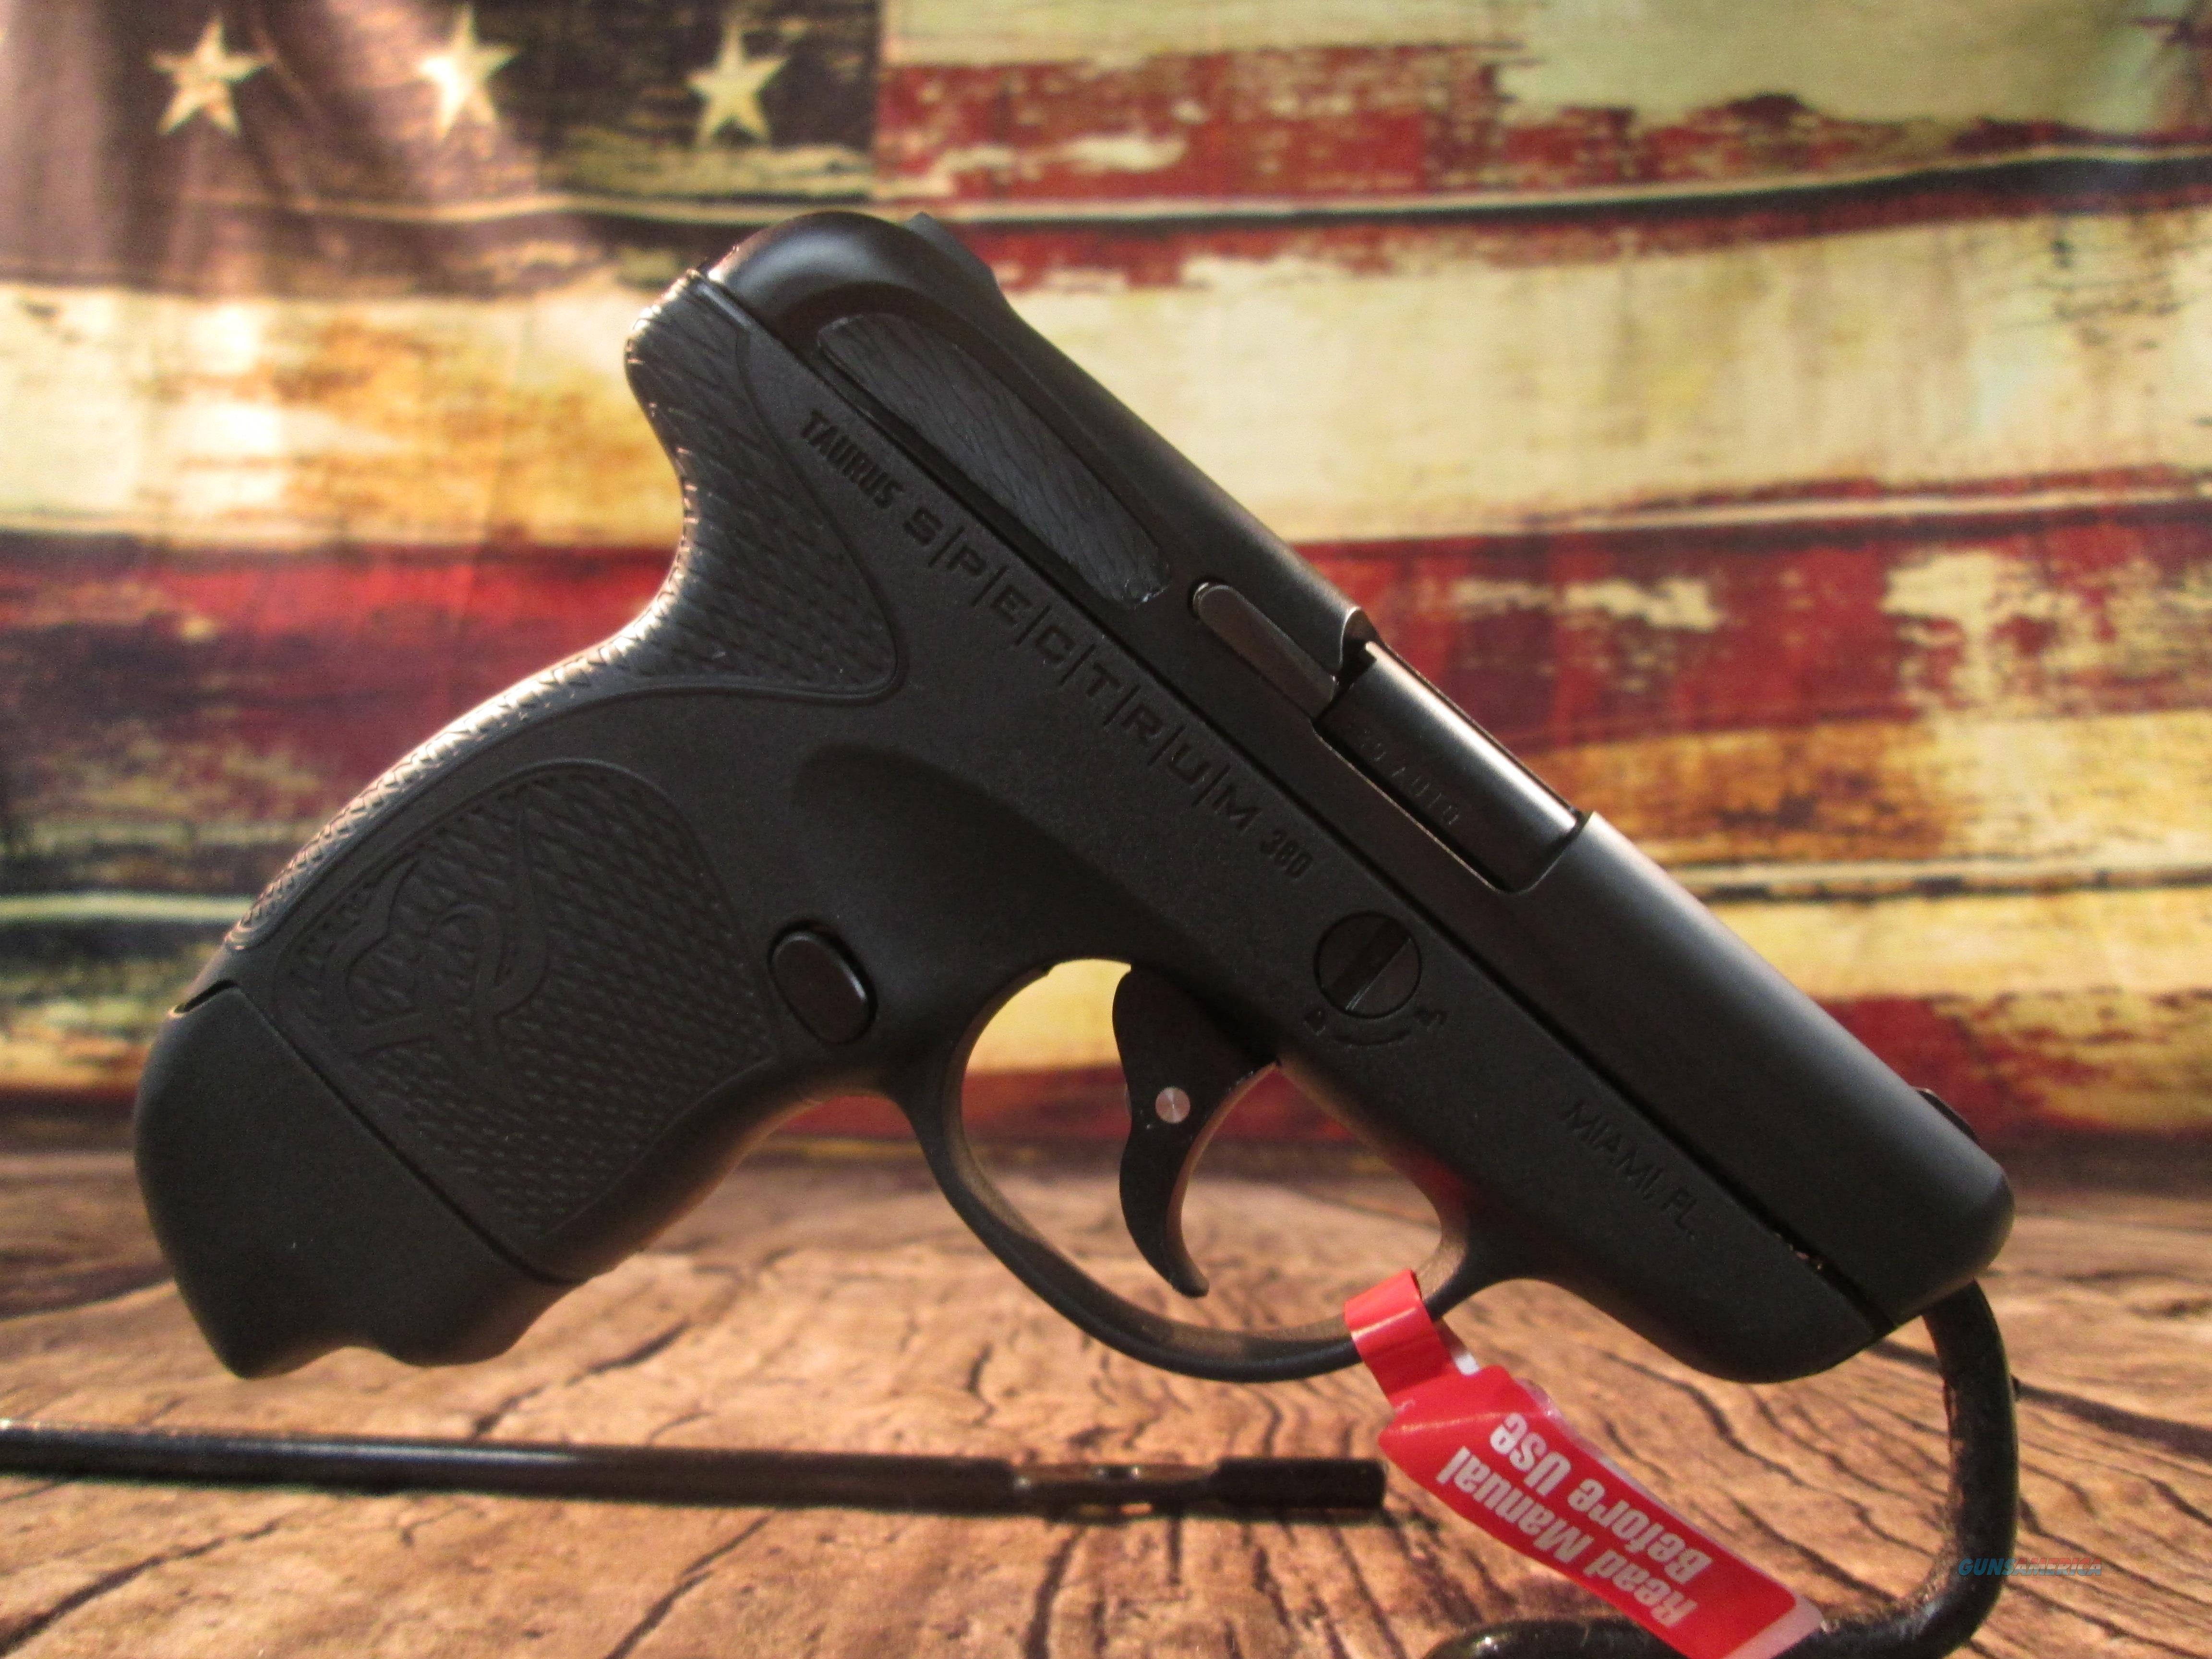 Taurus Spectrum .380 ACP New (1007031101)  ** Mail In Rebate**  Guns > Pistols > Taurus Pistols > Semi Auto Pistols > Polymer Frame